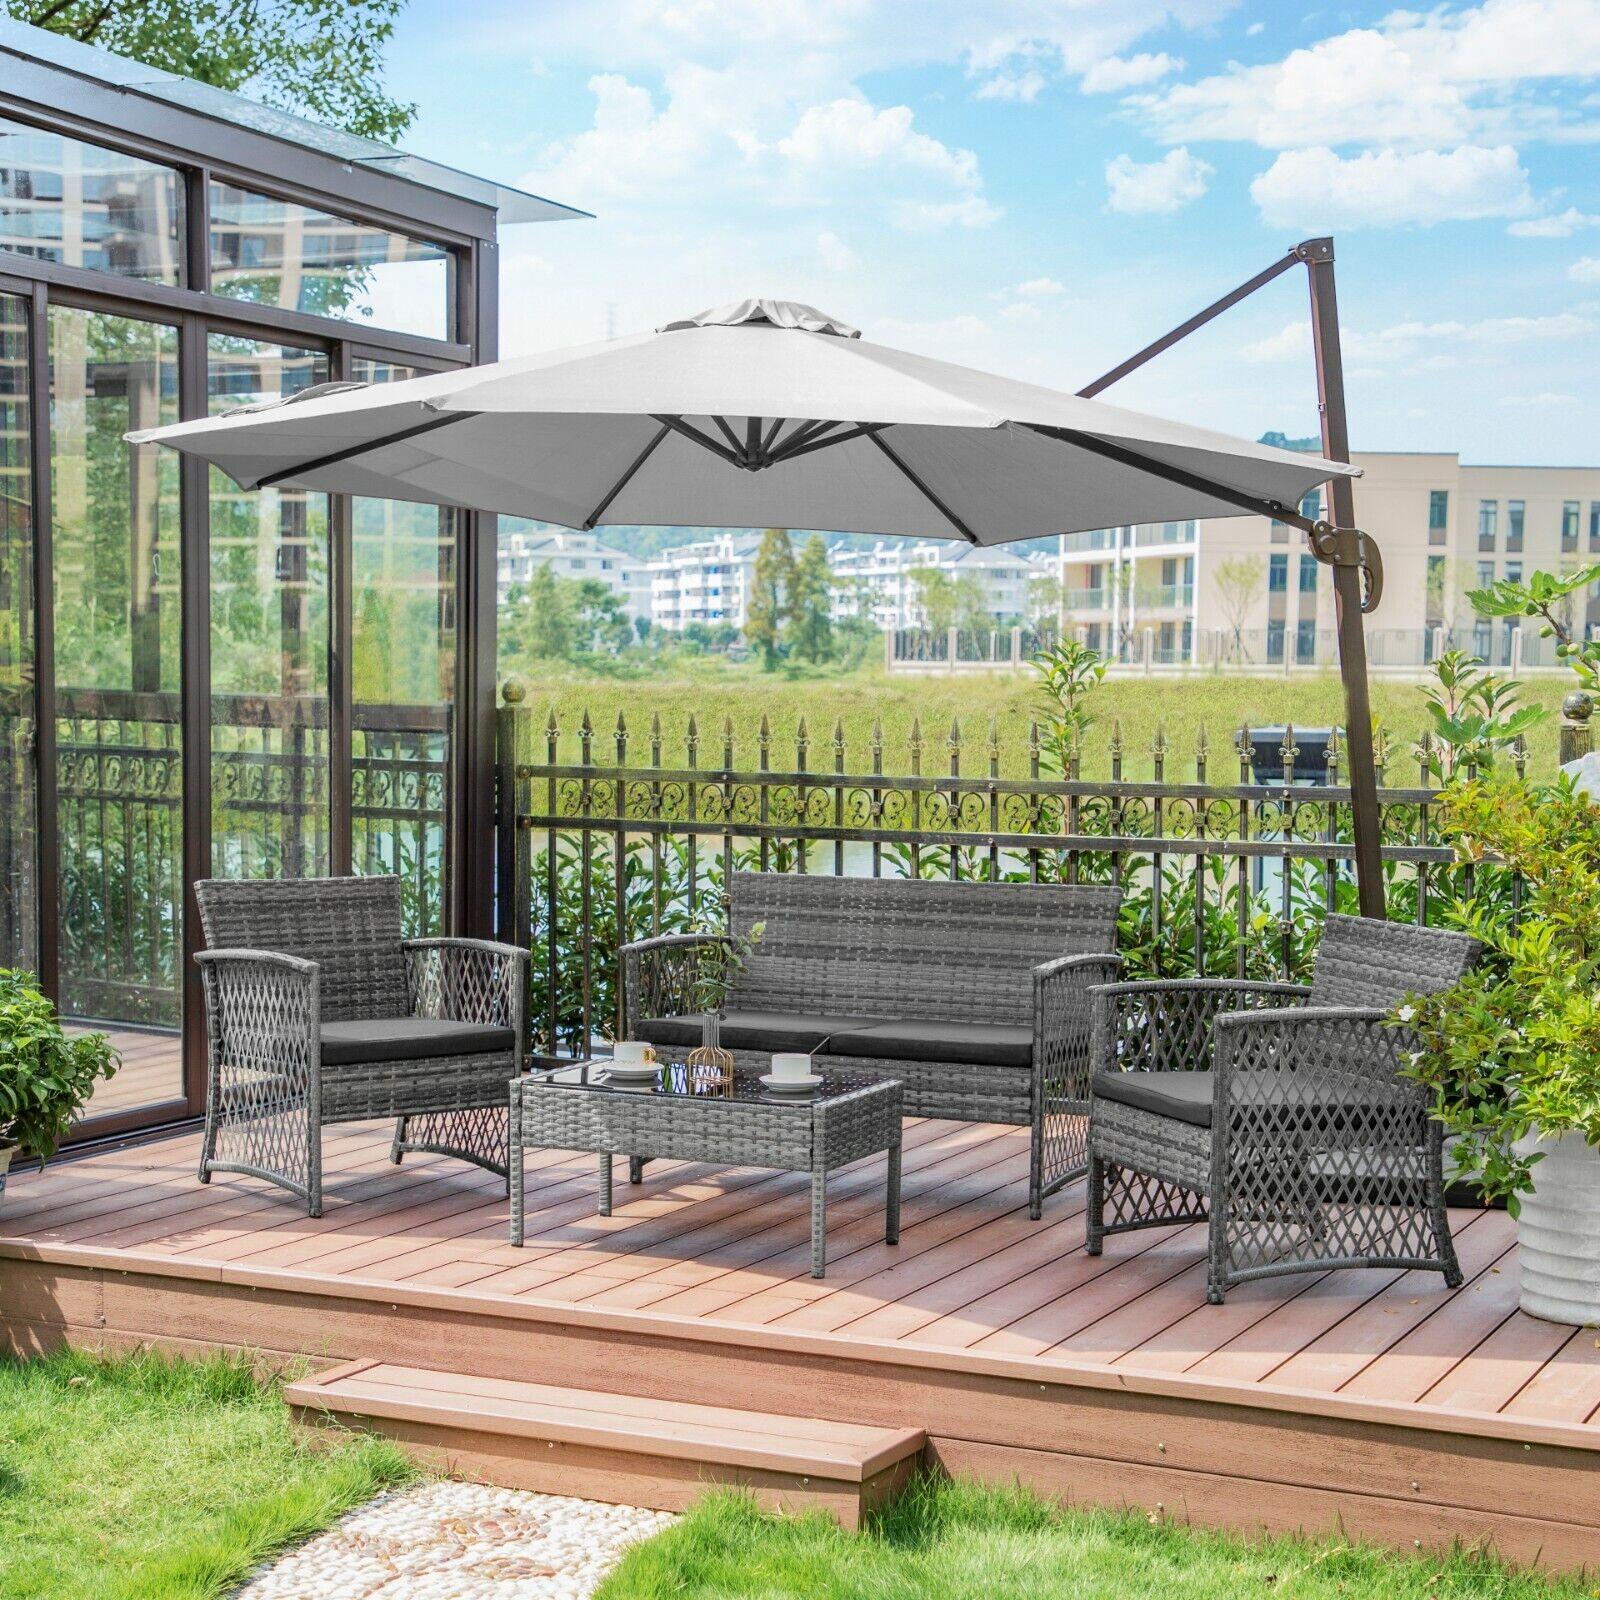 Garden Furniture - 4PC Furniture Patio Outdoor Rattan Wicker Conversation Sofa Table Cushion Garden